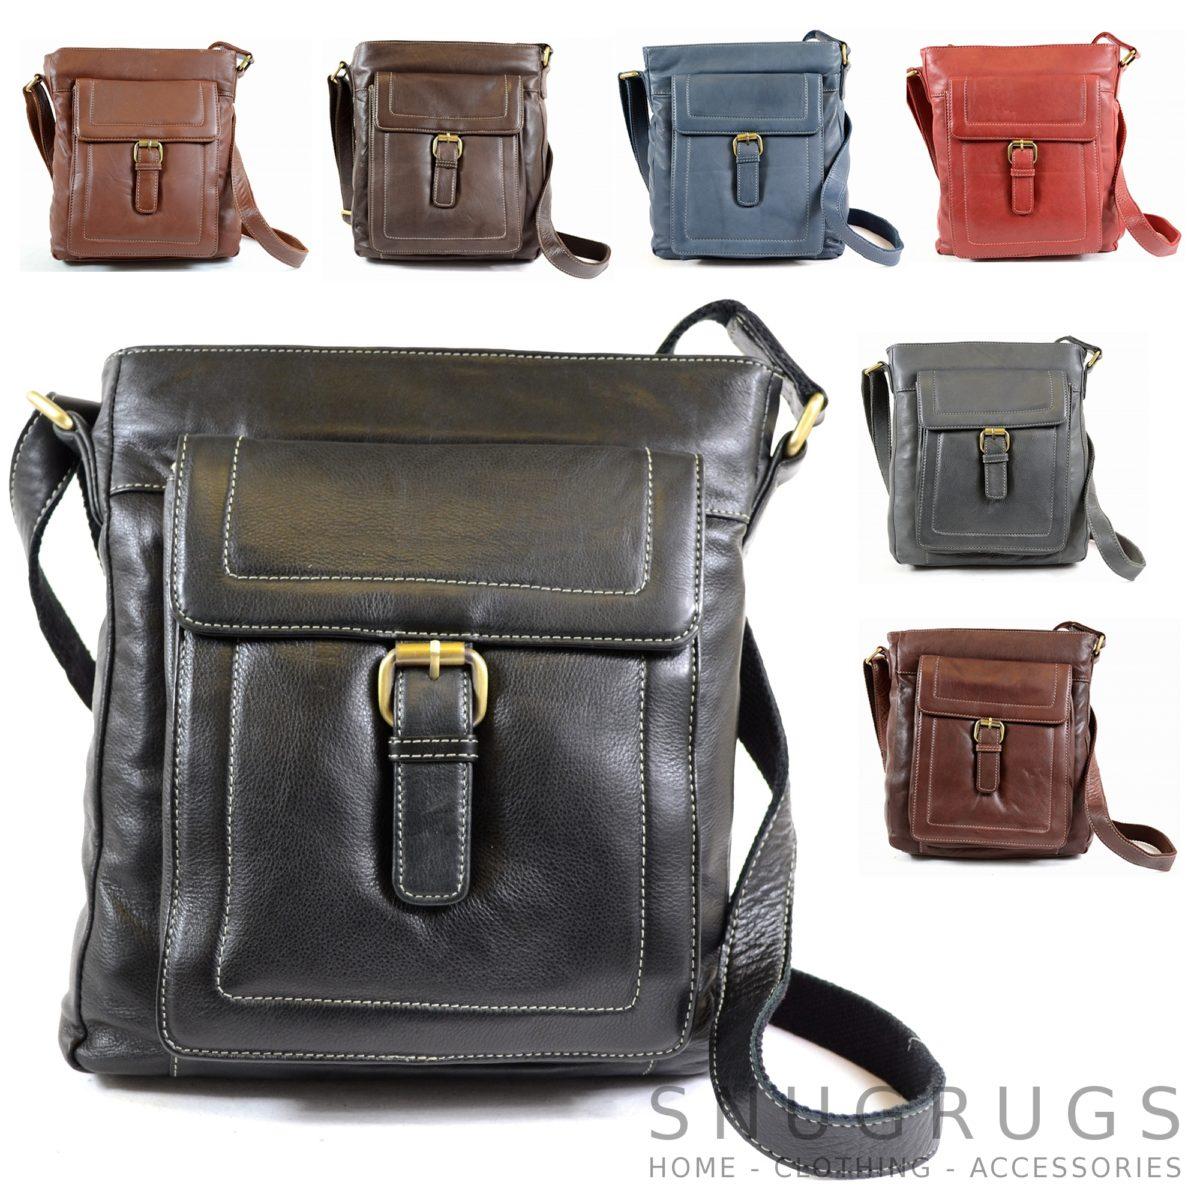 Sienna – Soft Leather Shoulder / Cross Body Bag